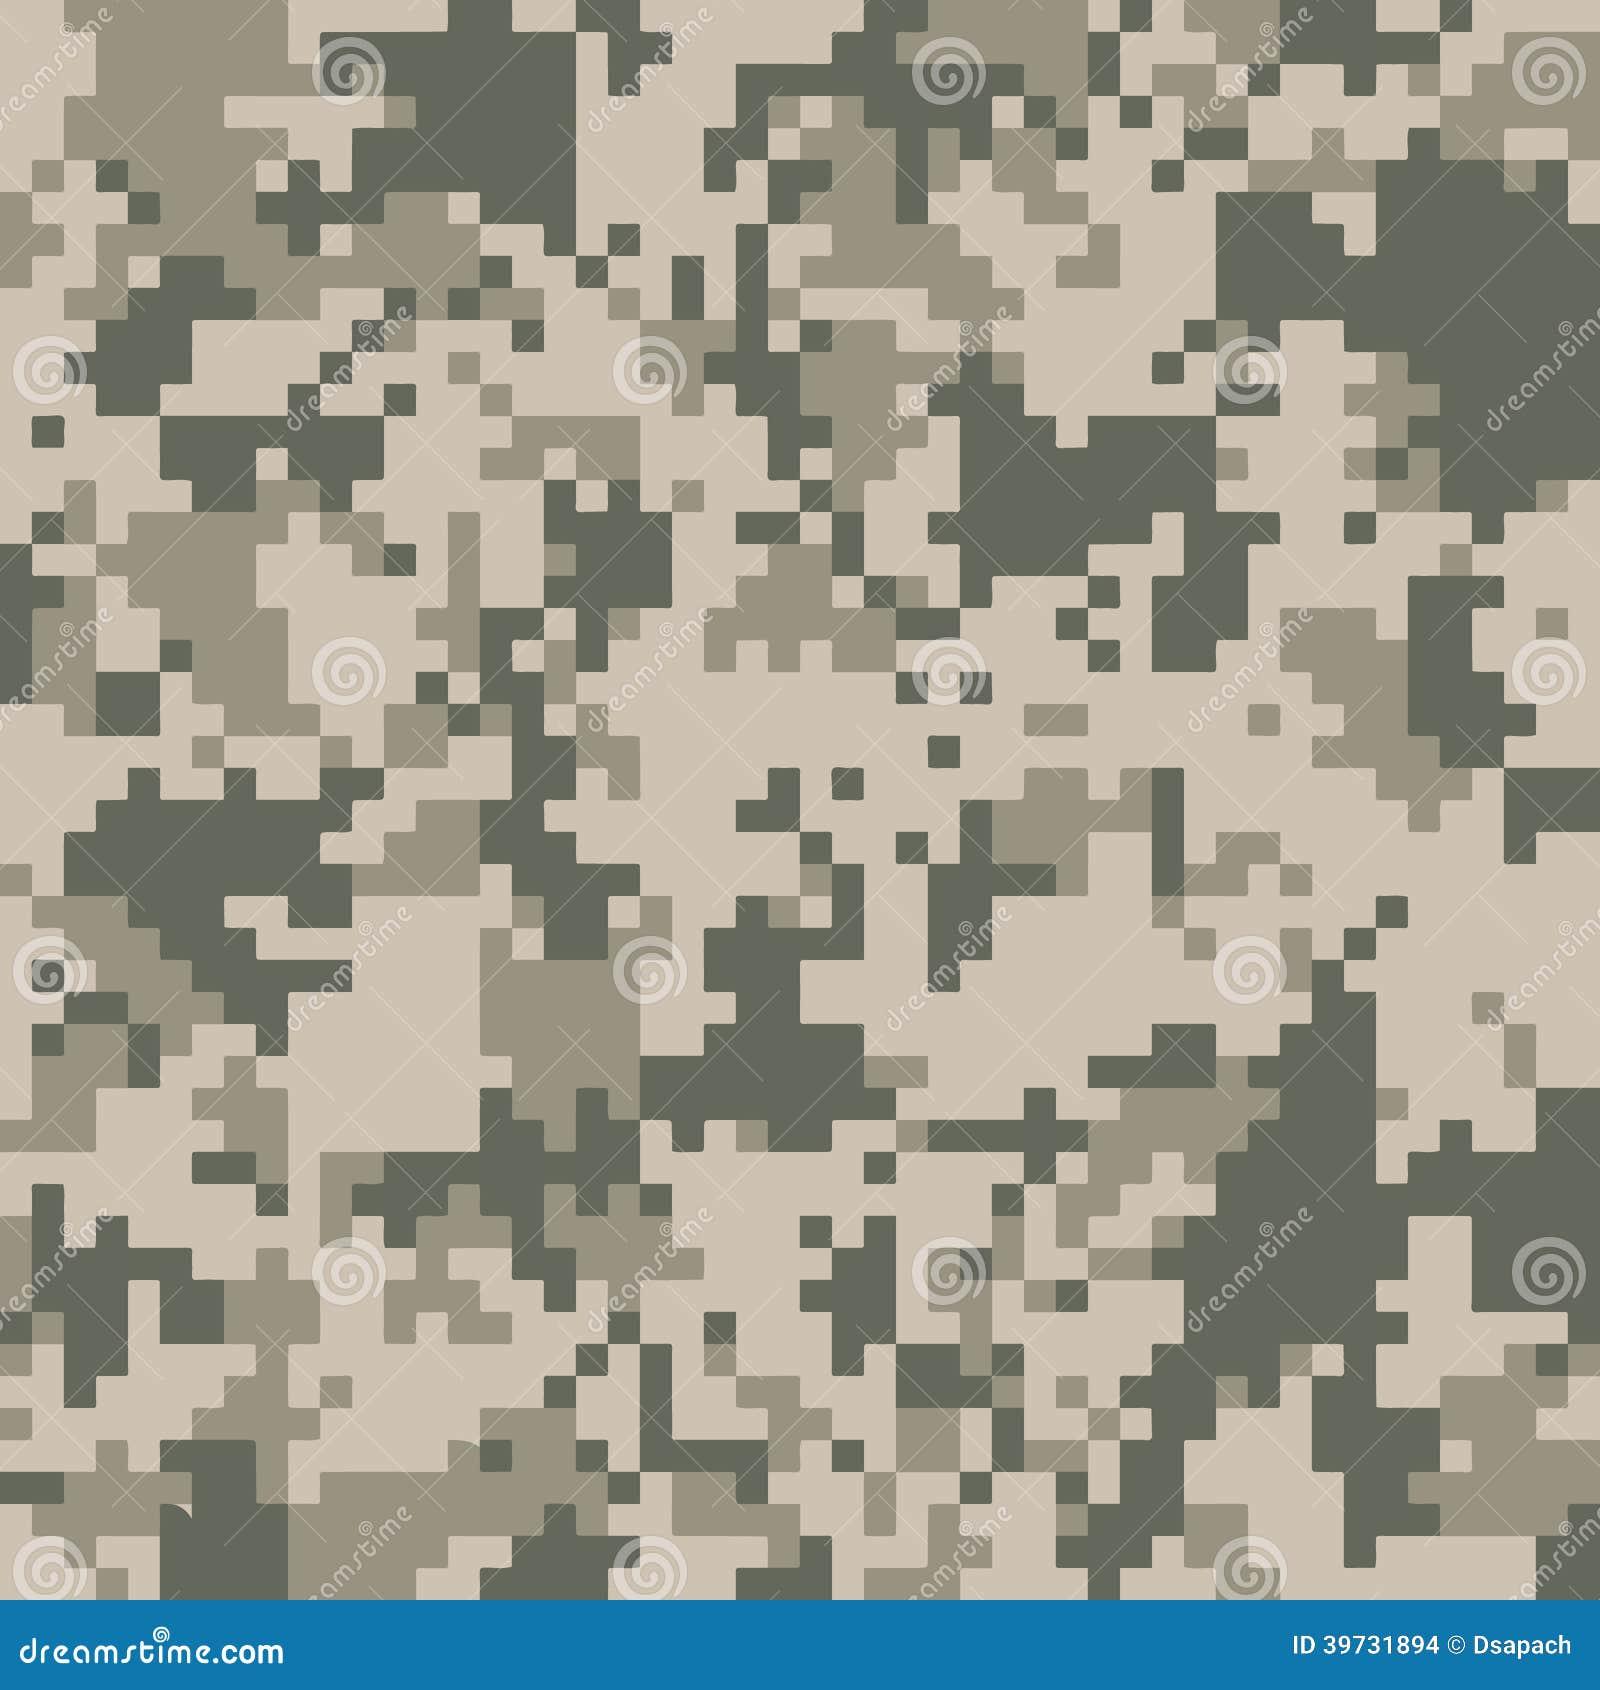 Digital Camo Texture Stock Vector Illustration Of Fabric